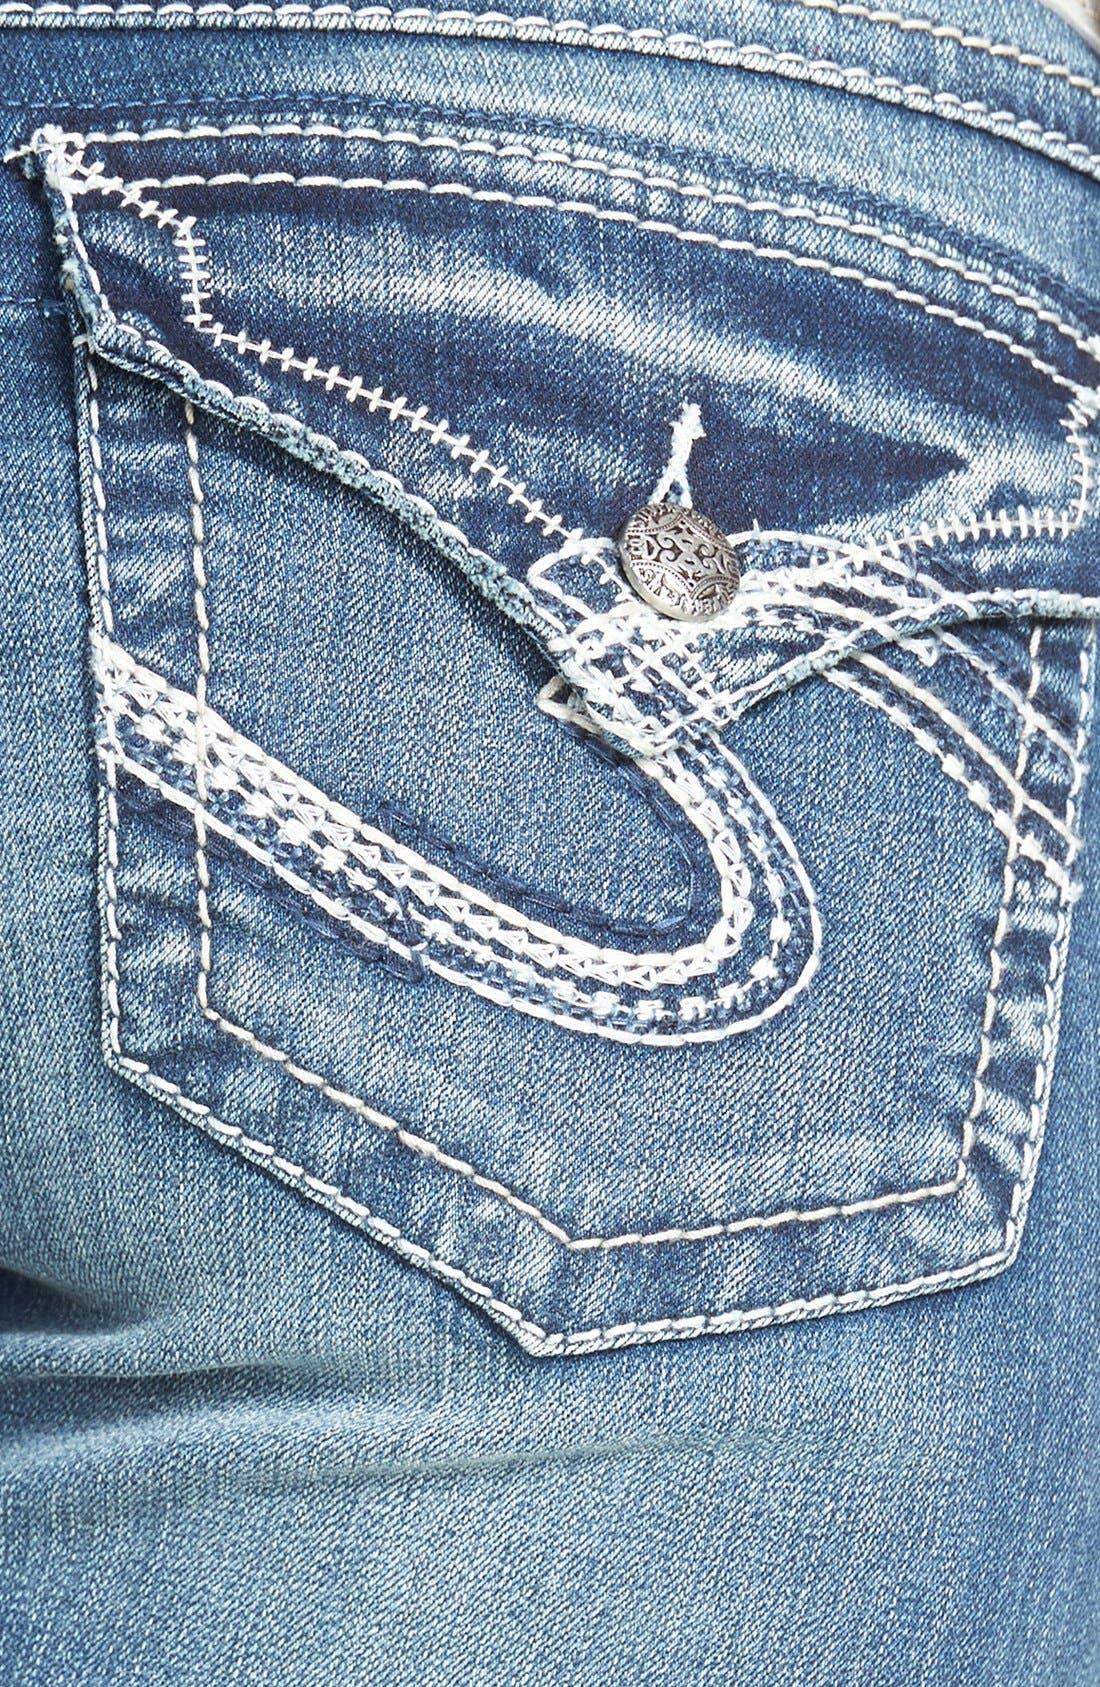 'Tuesday'  Flap Pocket Bootcut Jeans,                             Alternate thumbnail 3, color,                             402